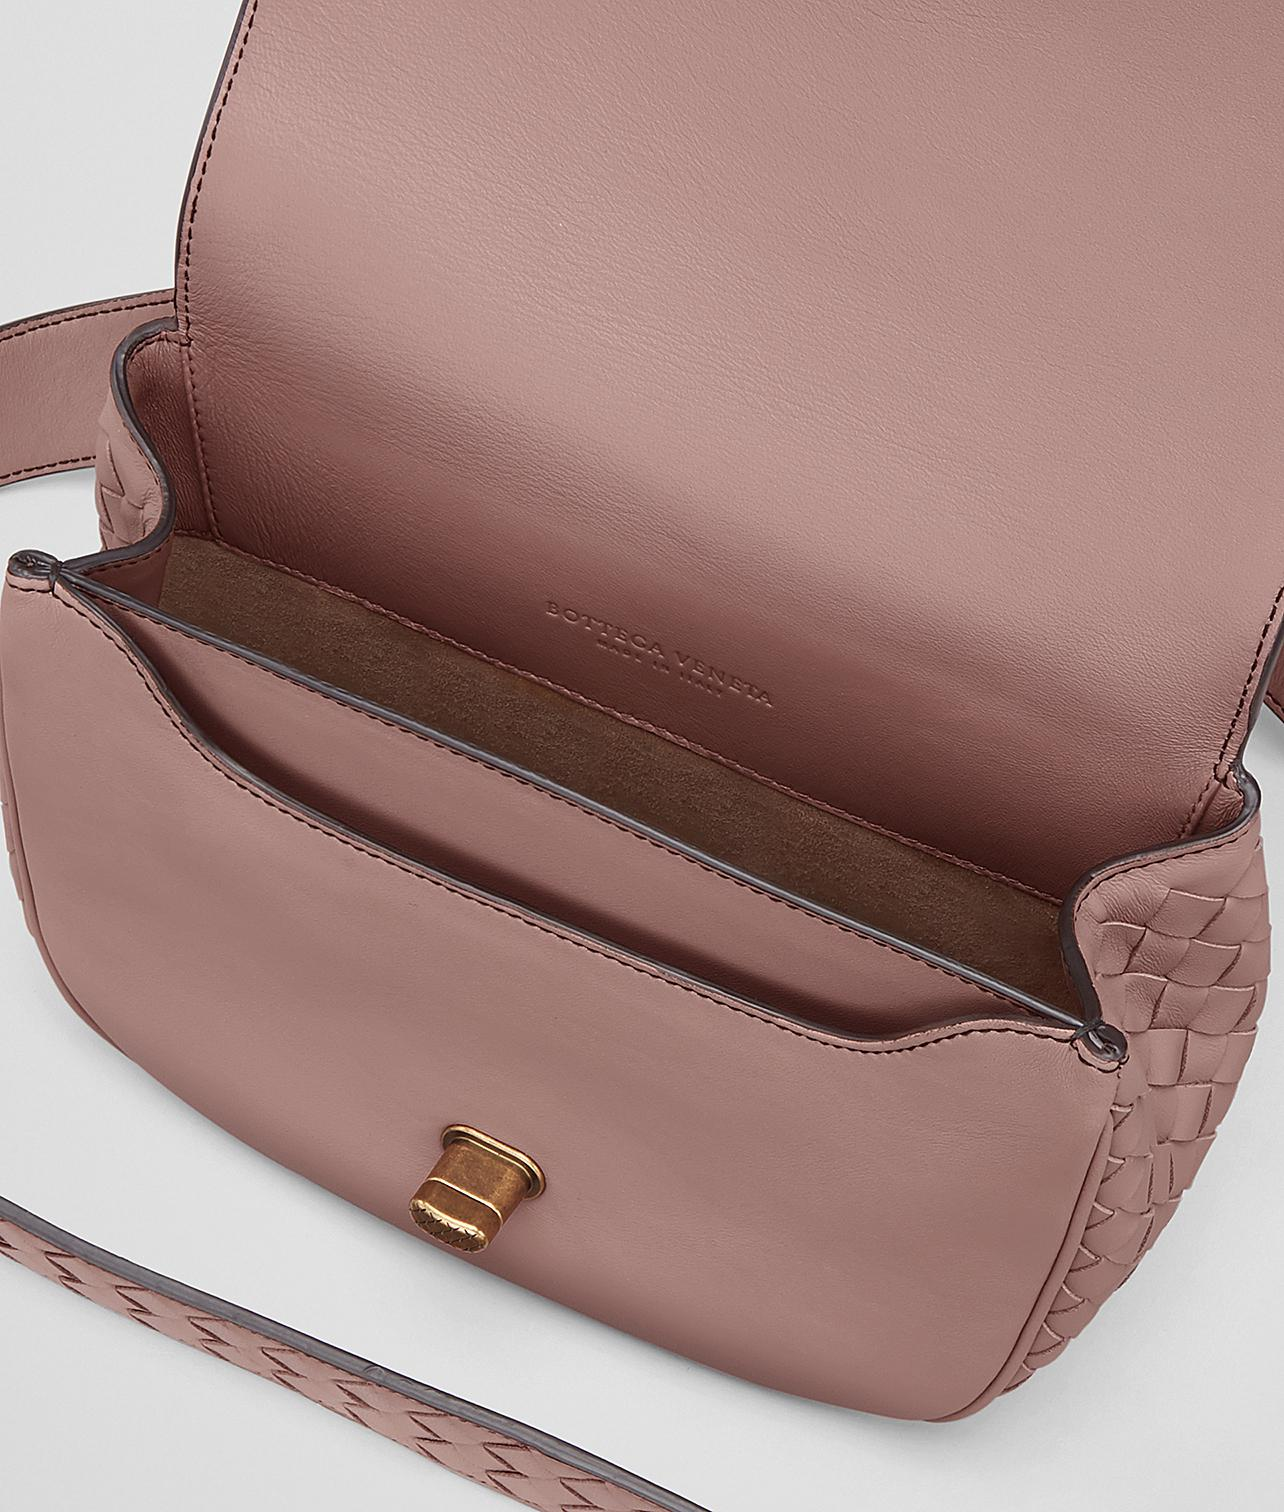 47d47f98b841 Bottega Veneta - Pink Bv Luna Bag In Nappa - Lyst. View fullscreen